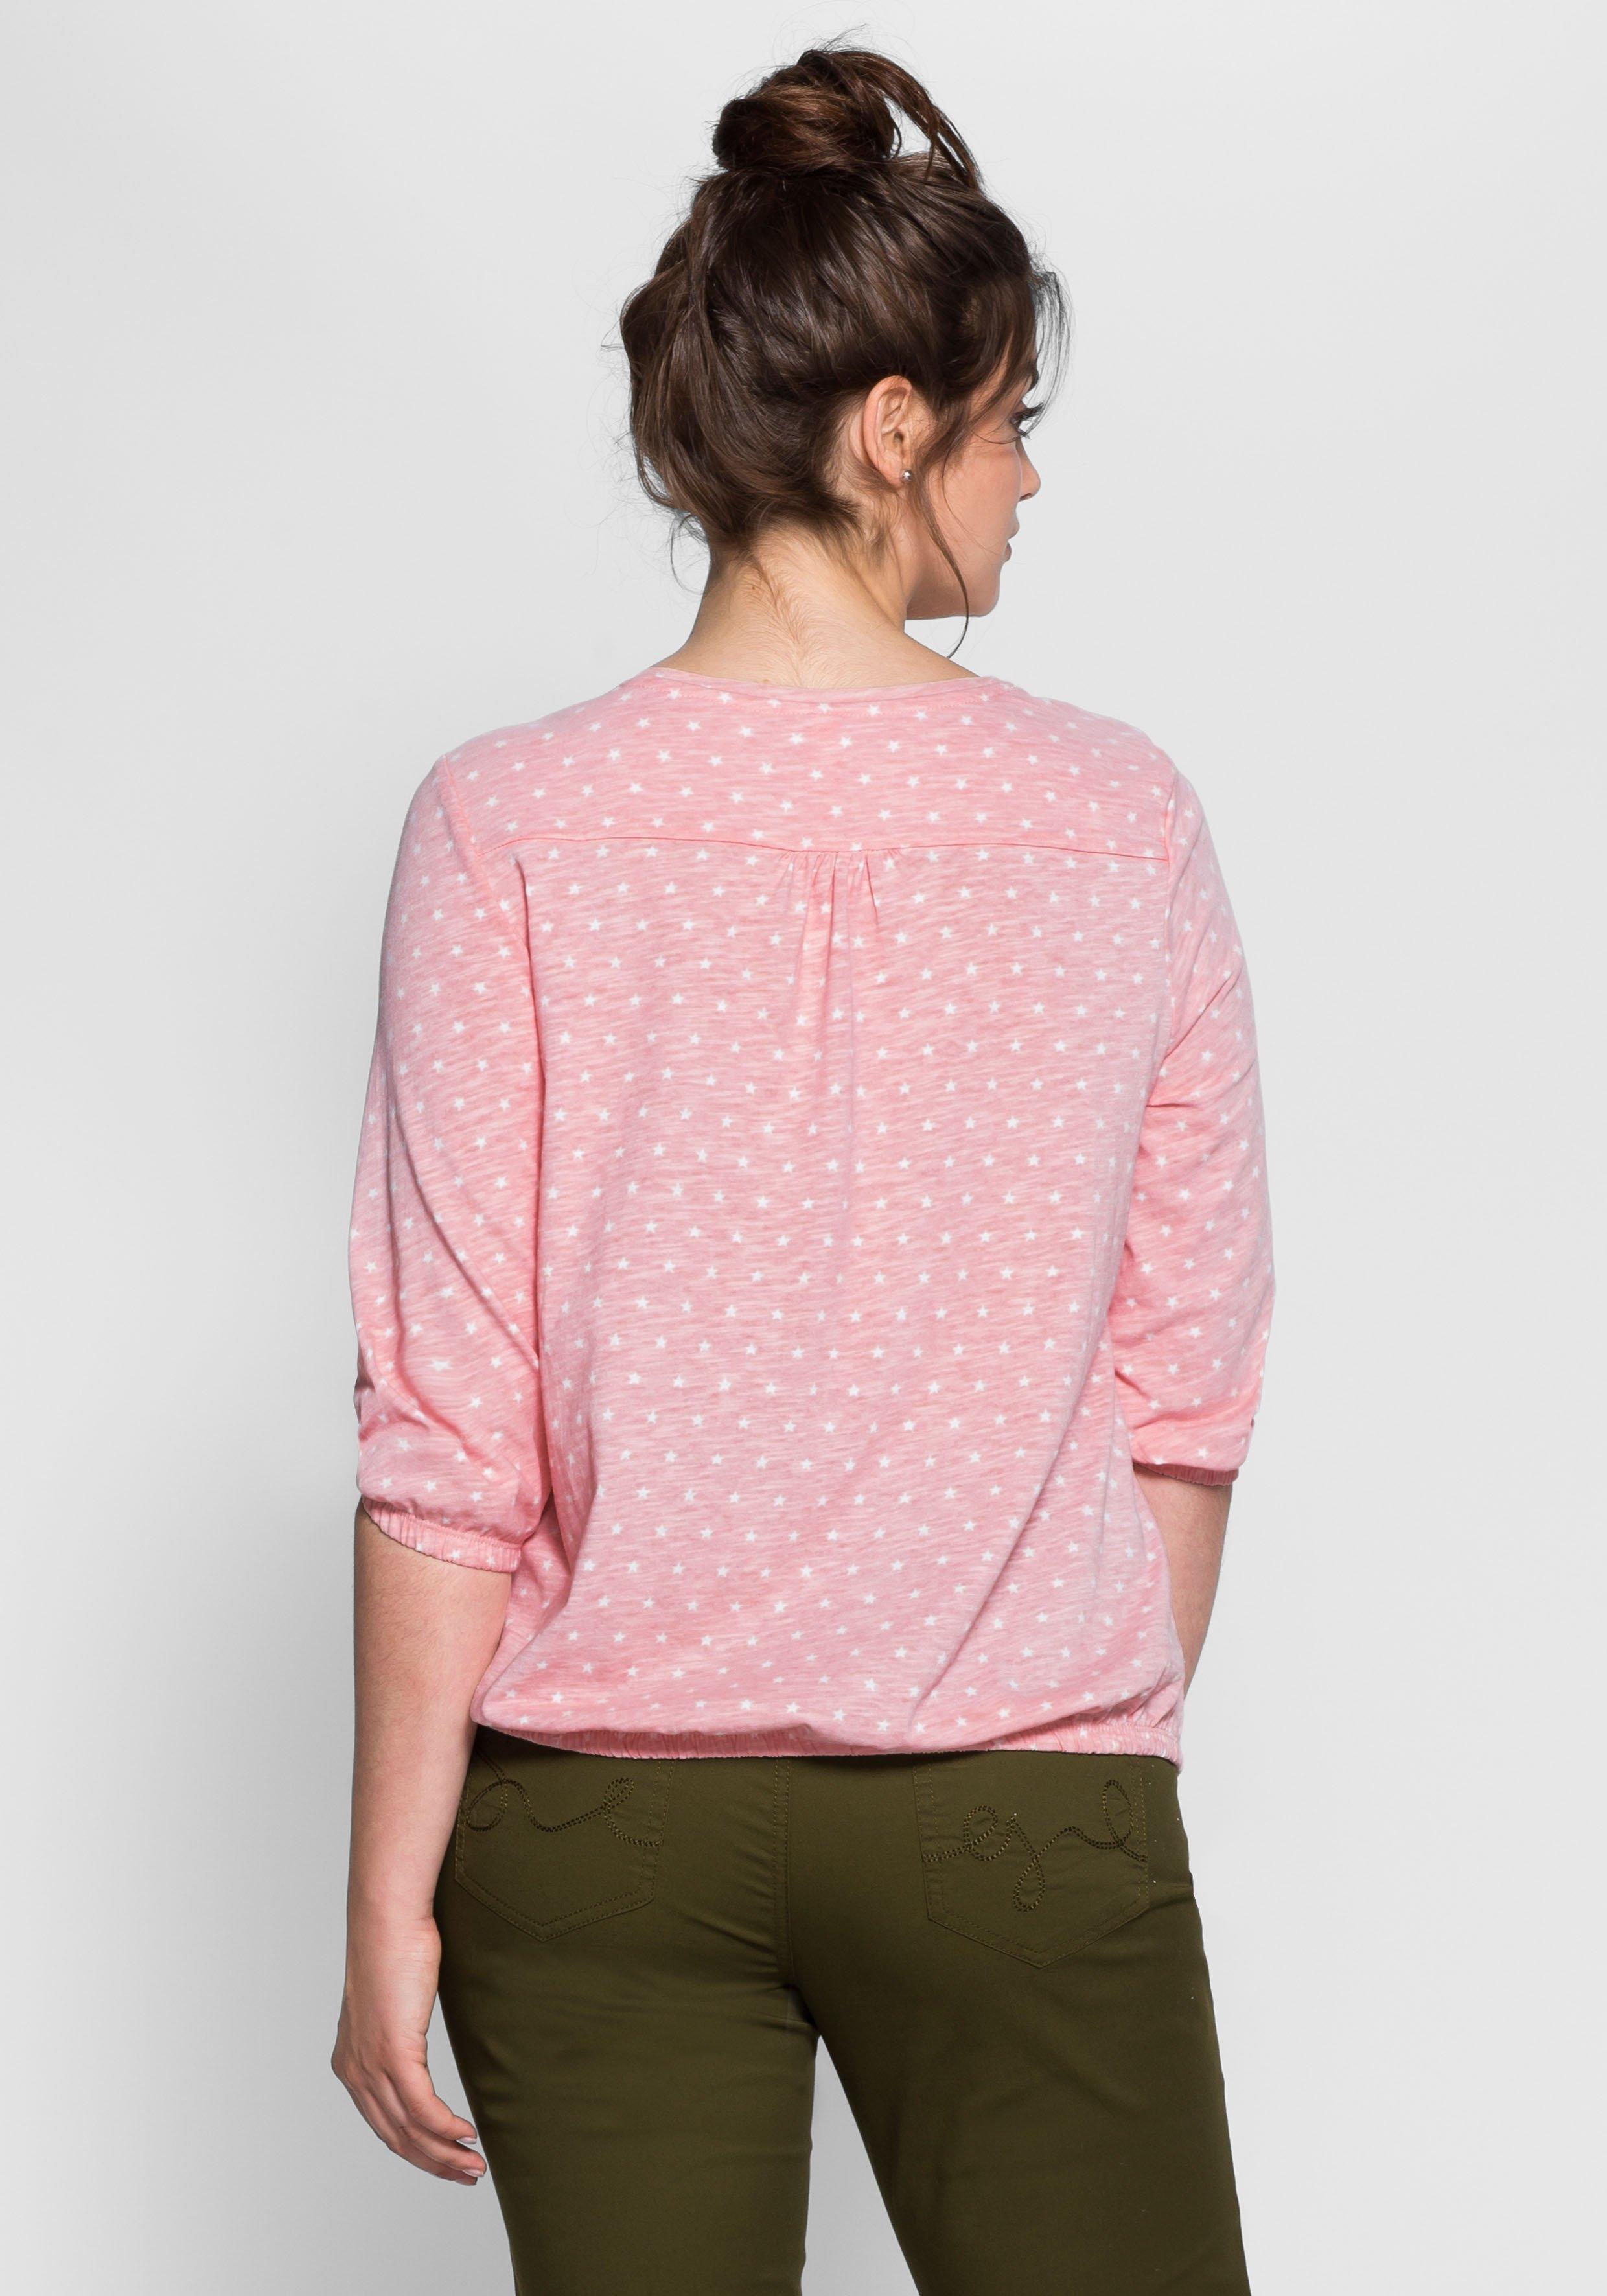 shirt Allover Met print Casual Bestellen Sheego Nu T Online PZuXOiwkT